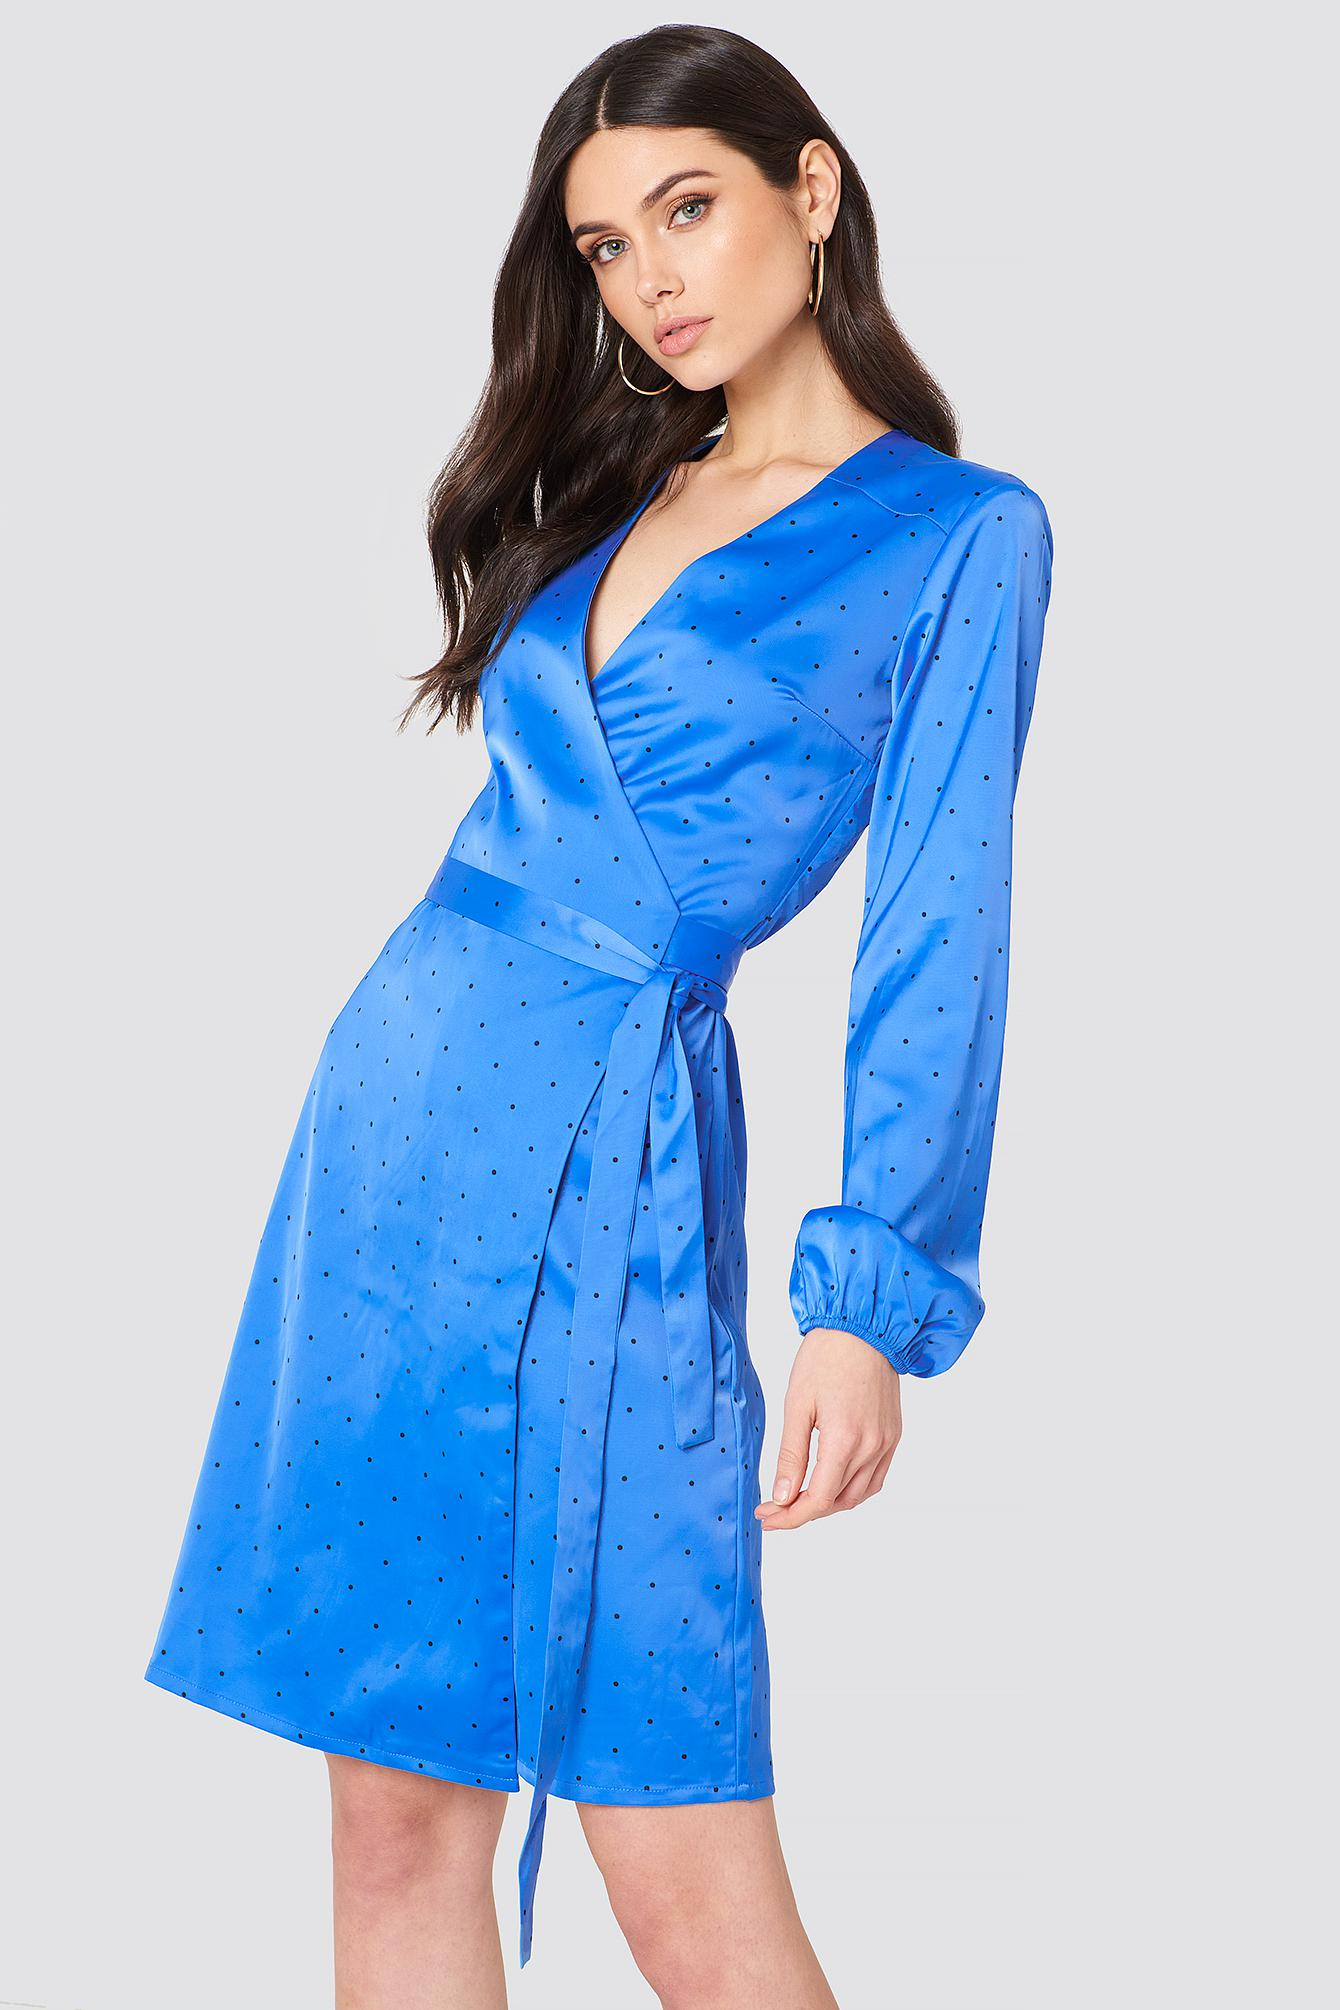 Footlocker Finishline Cheap Price Ebay Online Polka Dot Wrap Dress - Granada sky Gestuz ovHYrCS9